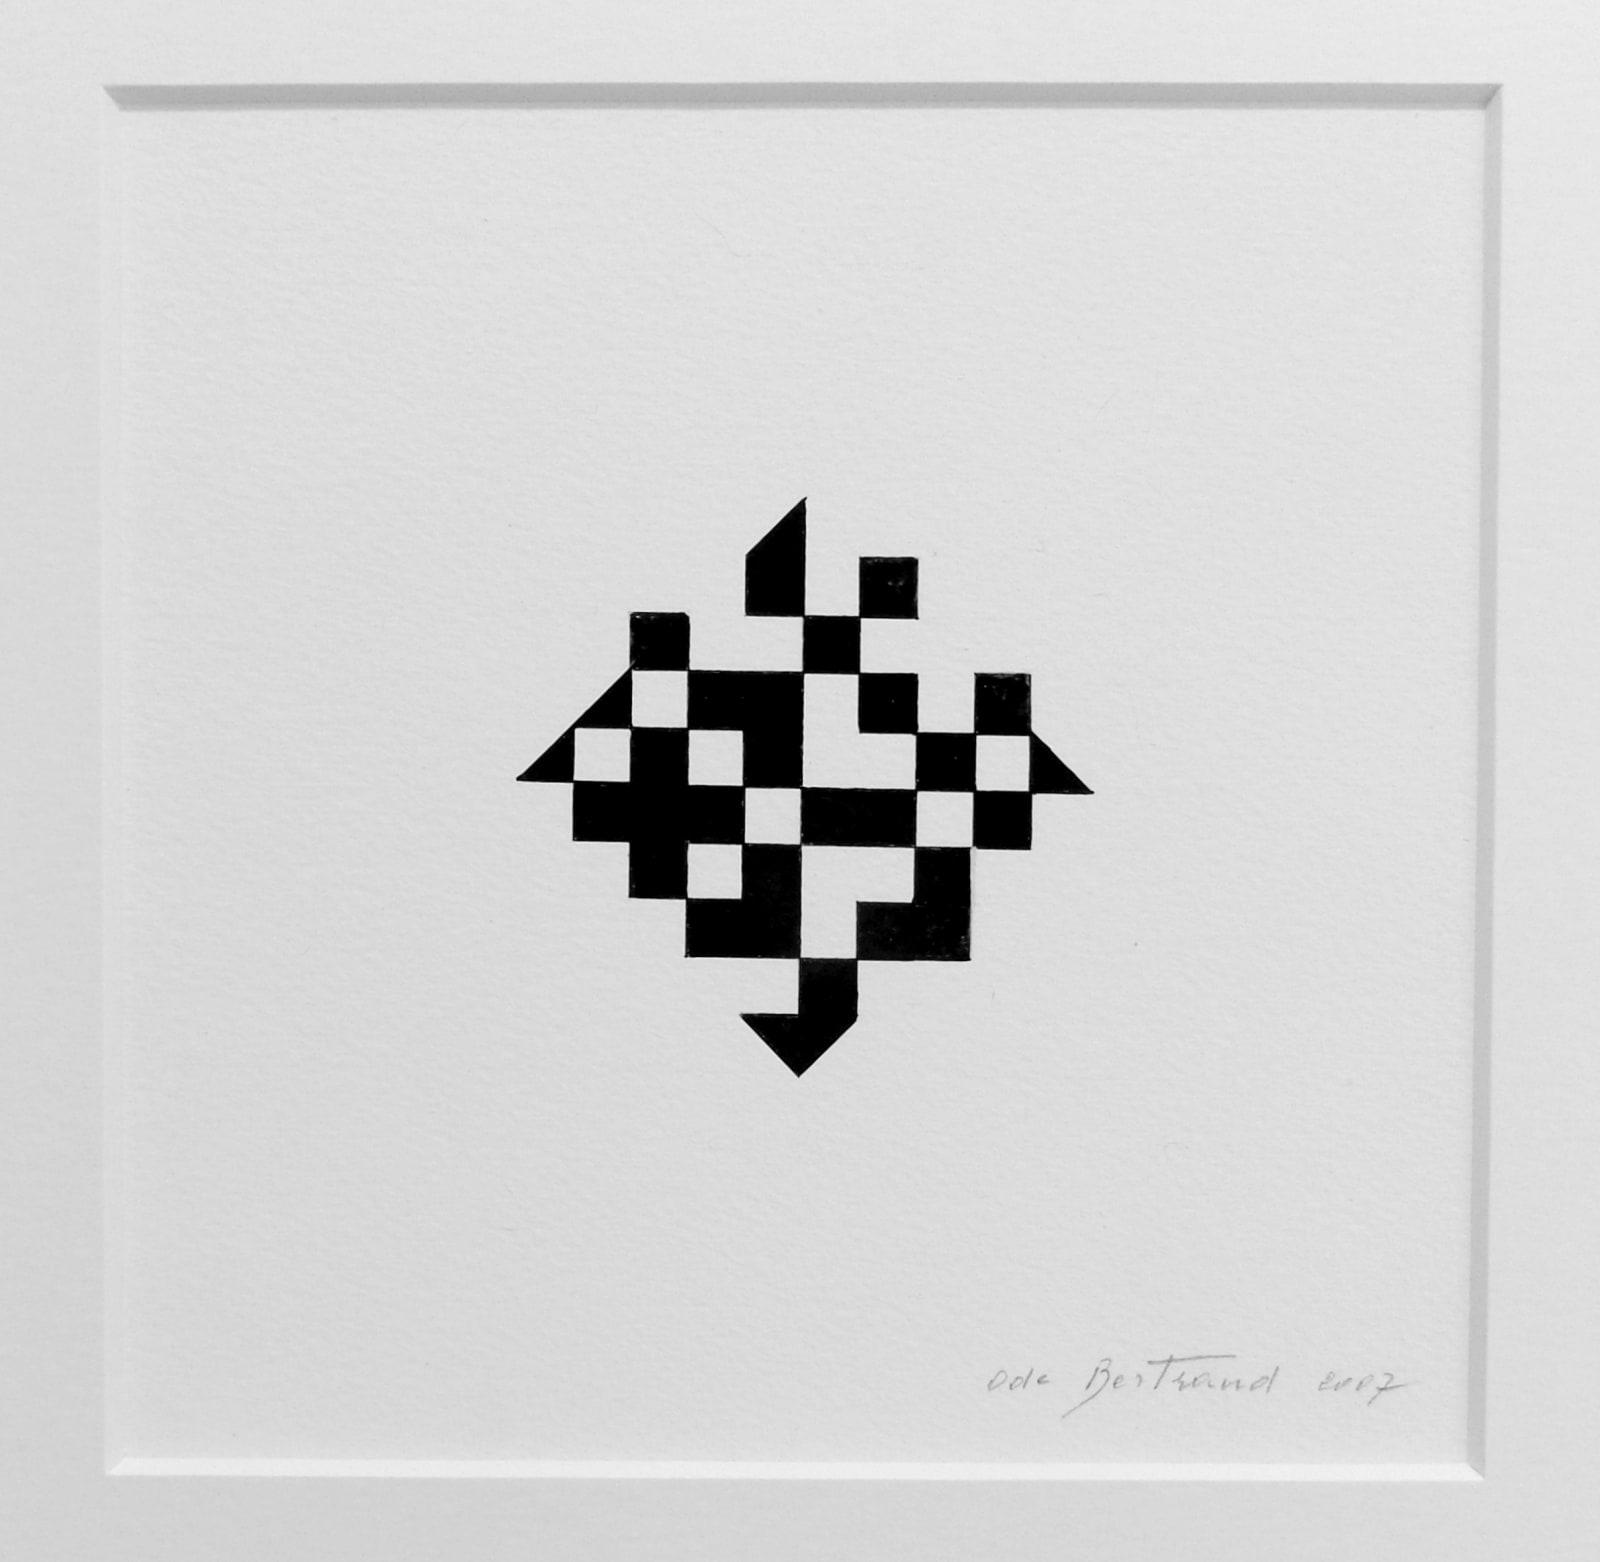 Ode BERTRAND, Miniature - Diamant 5, 2007